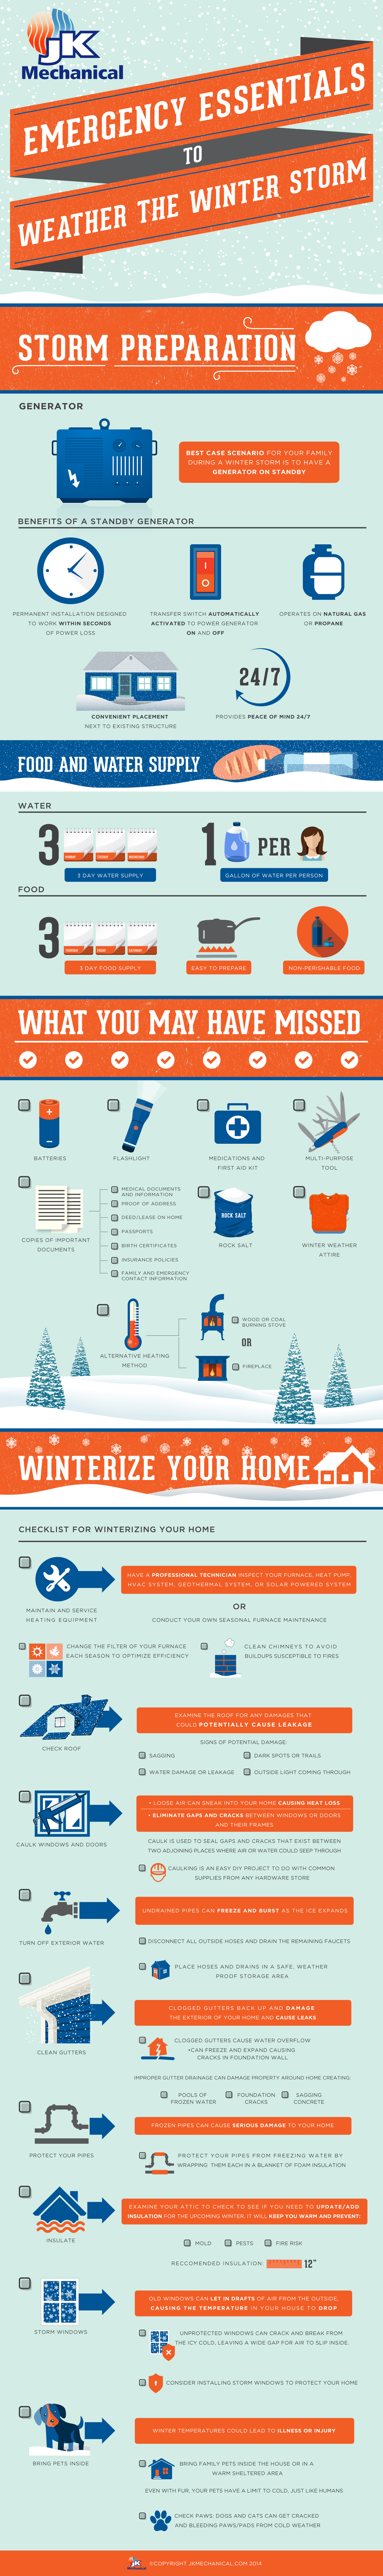 http://www.jkmechanical.com/emergency-essentials-for-winter-storm/